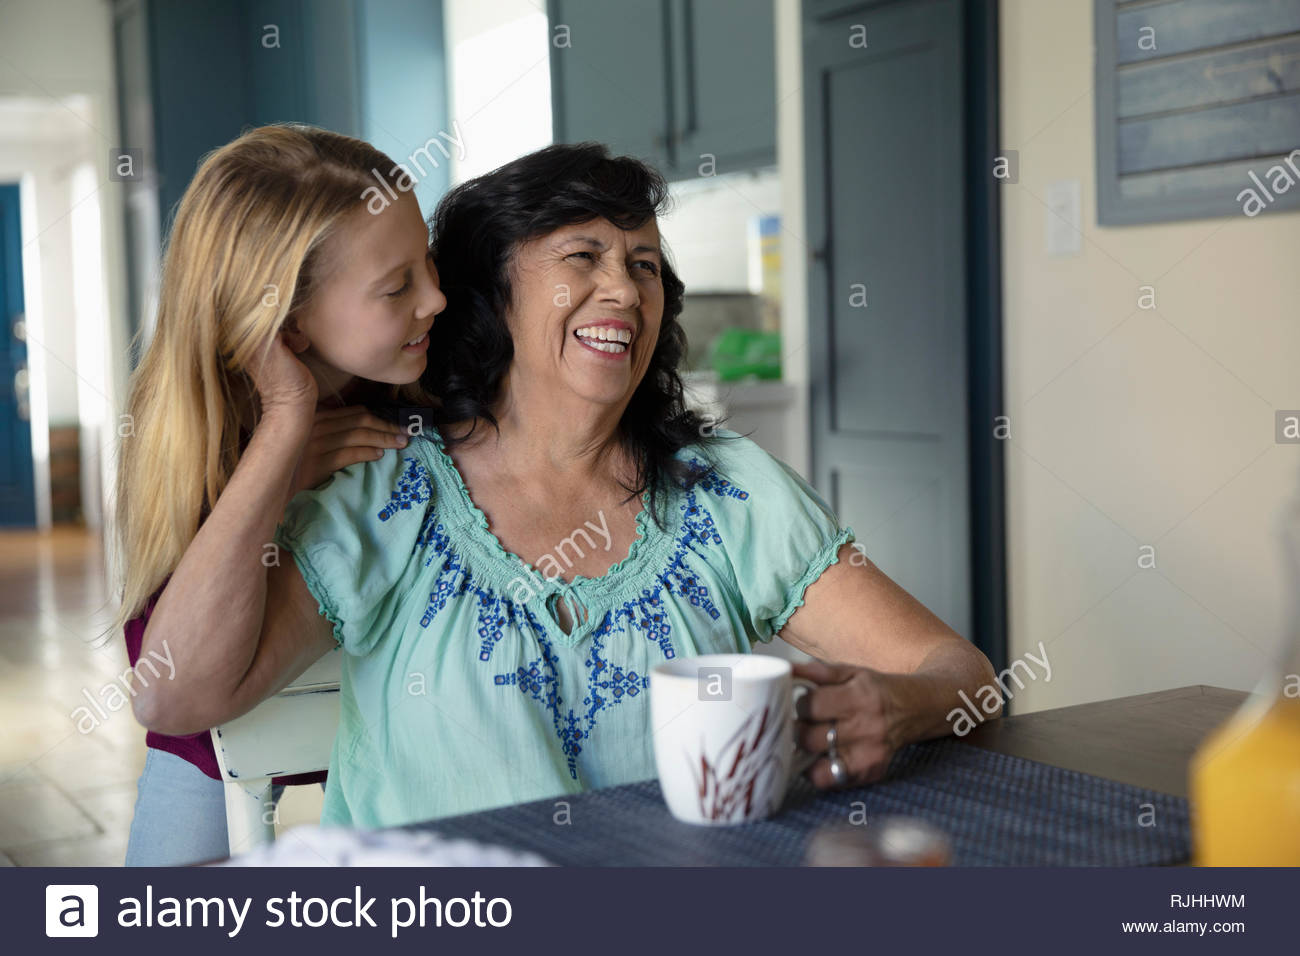 Petite-fille et grand-mère affectueuse Latinx à table de cuisine Photo Stock